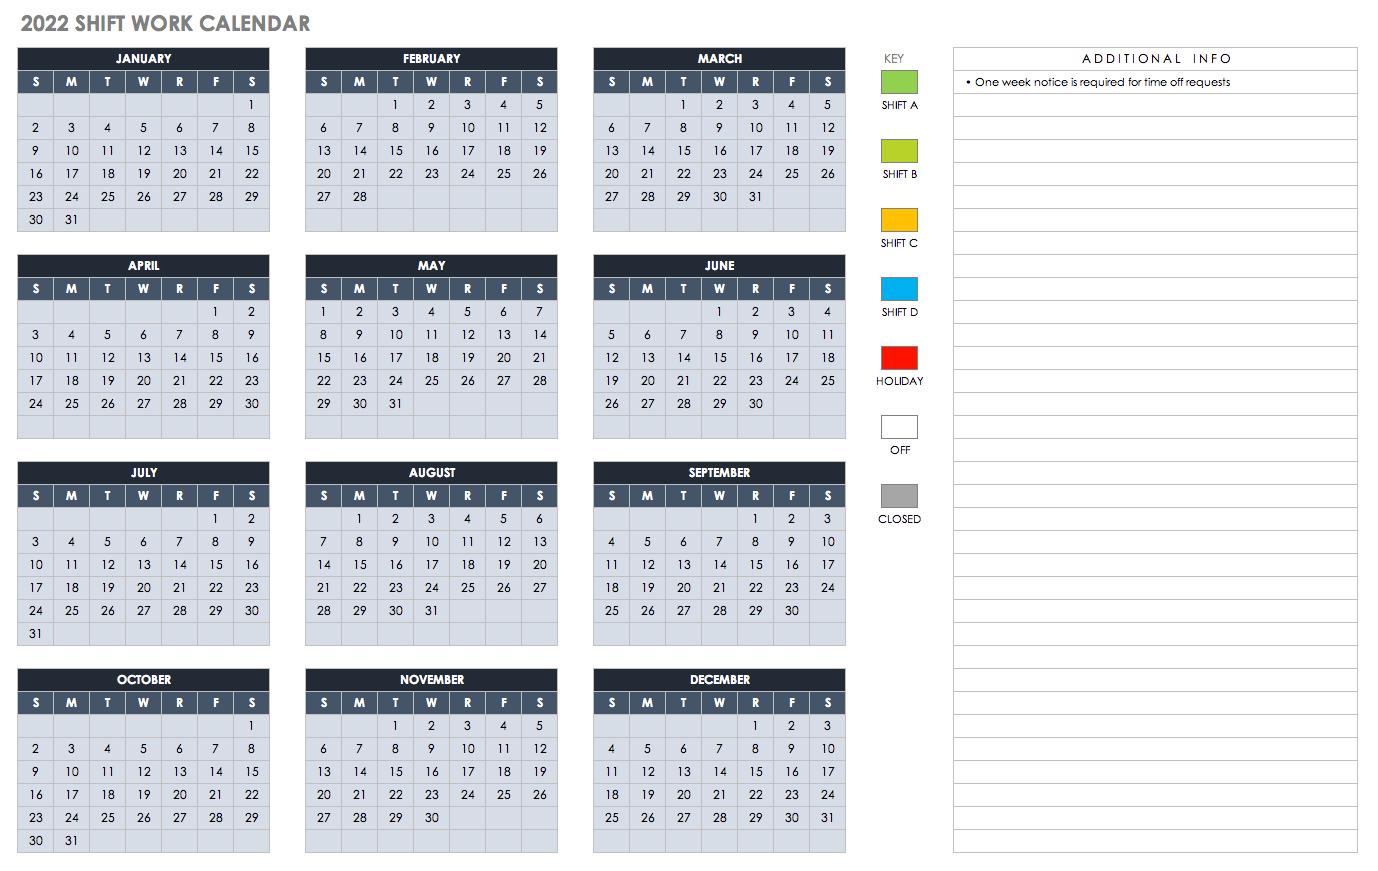 15 Free Monthly Calendar Templates   Smartsheet inside Shift Calendar 2021